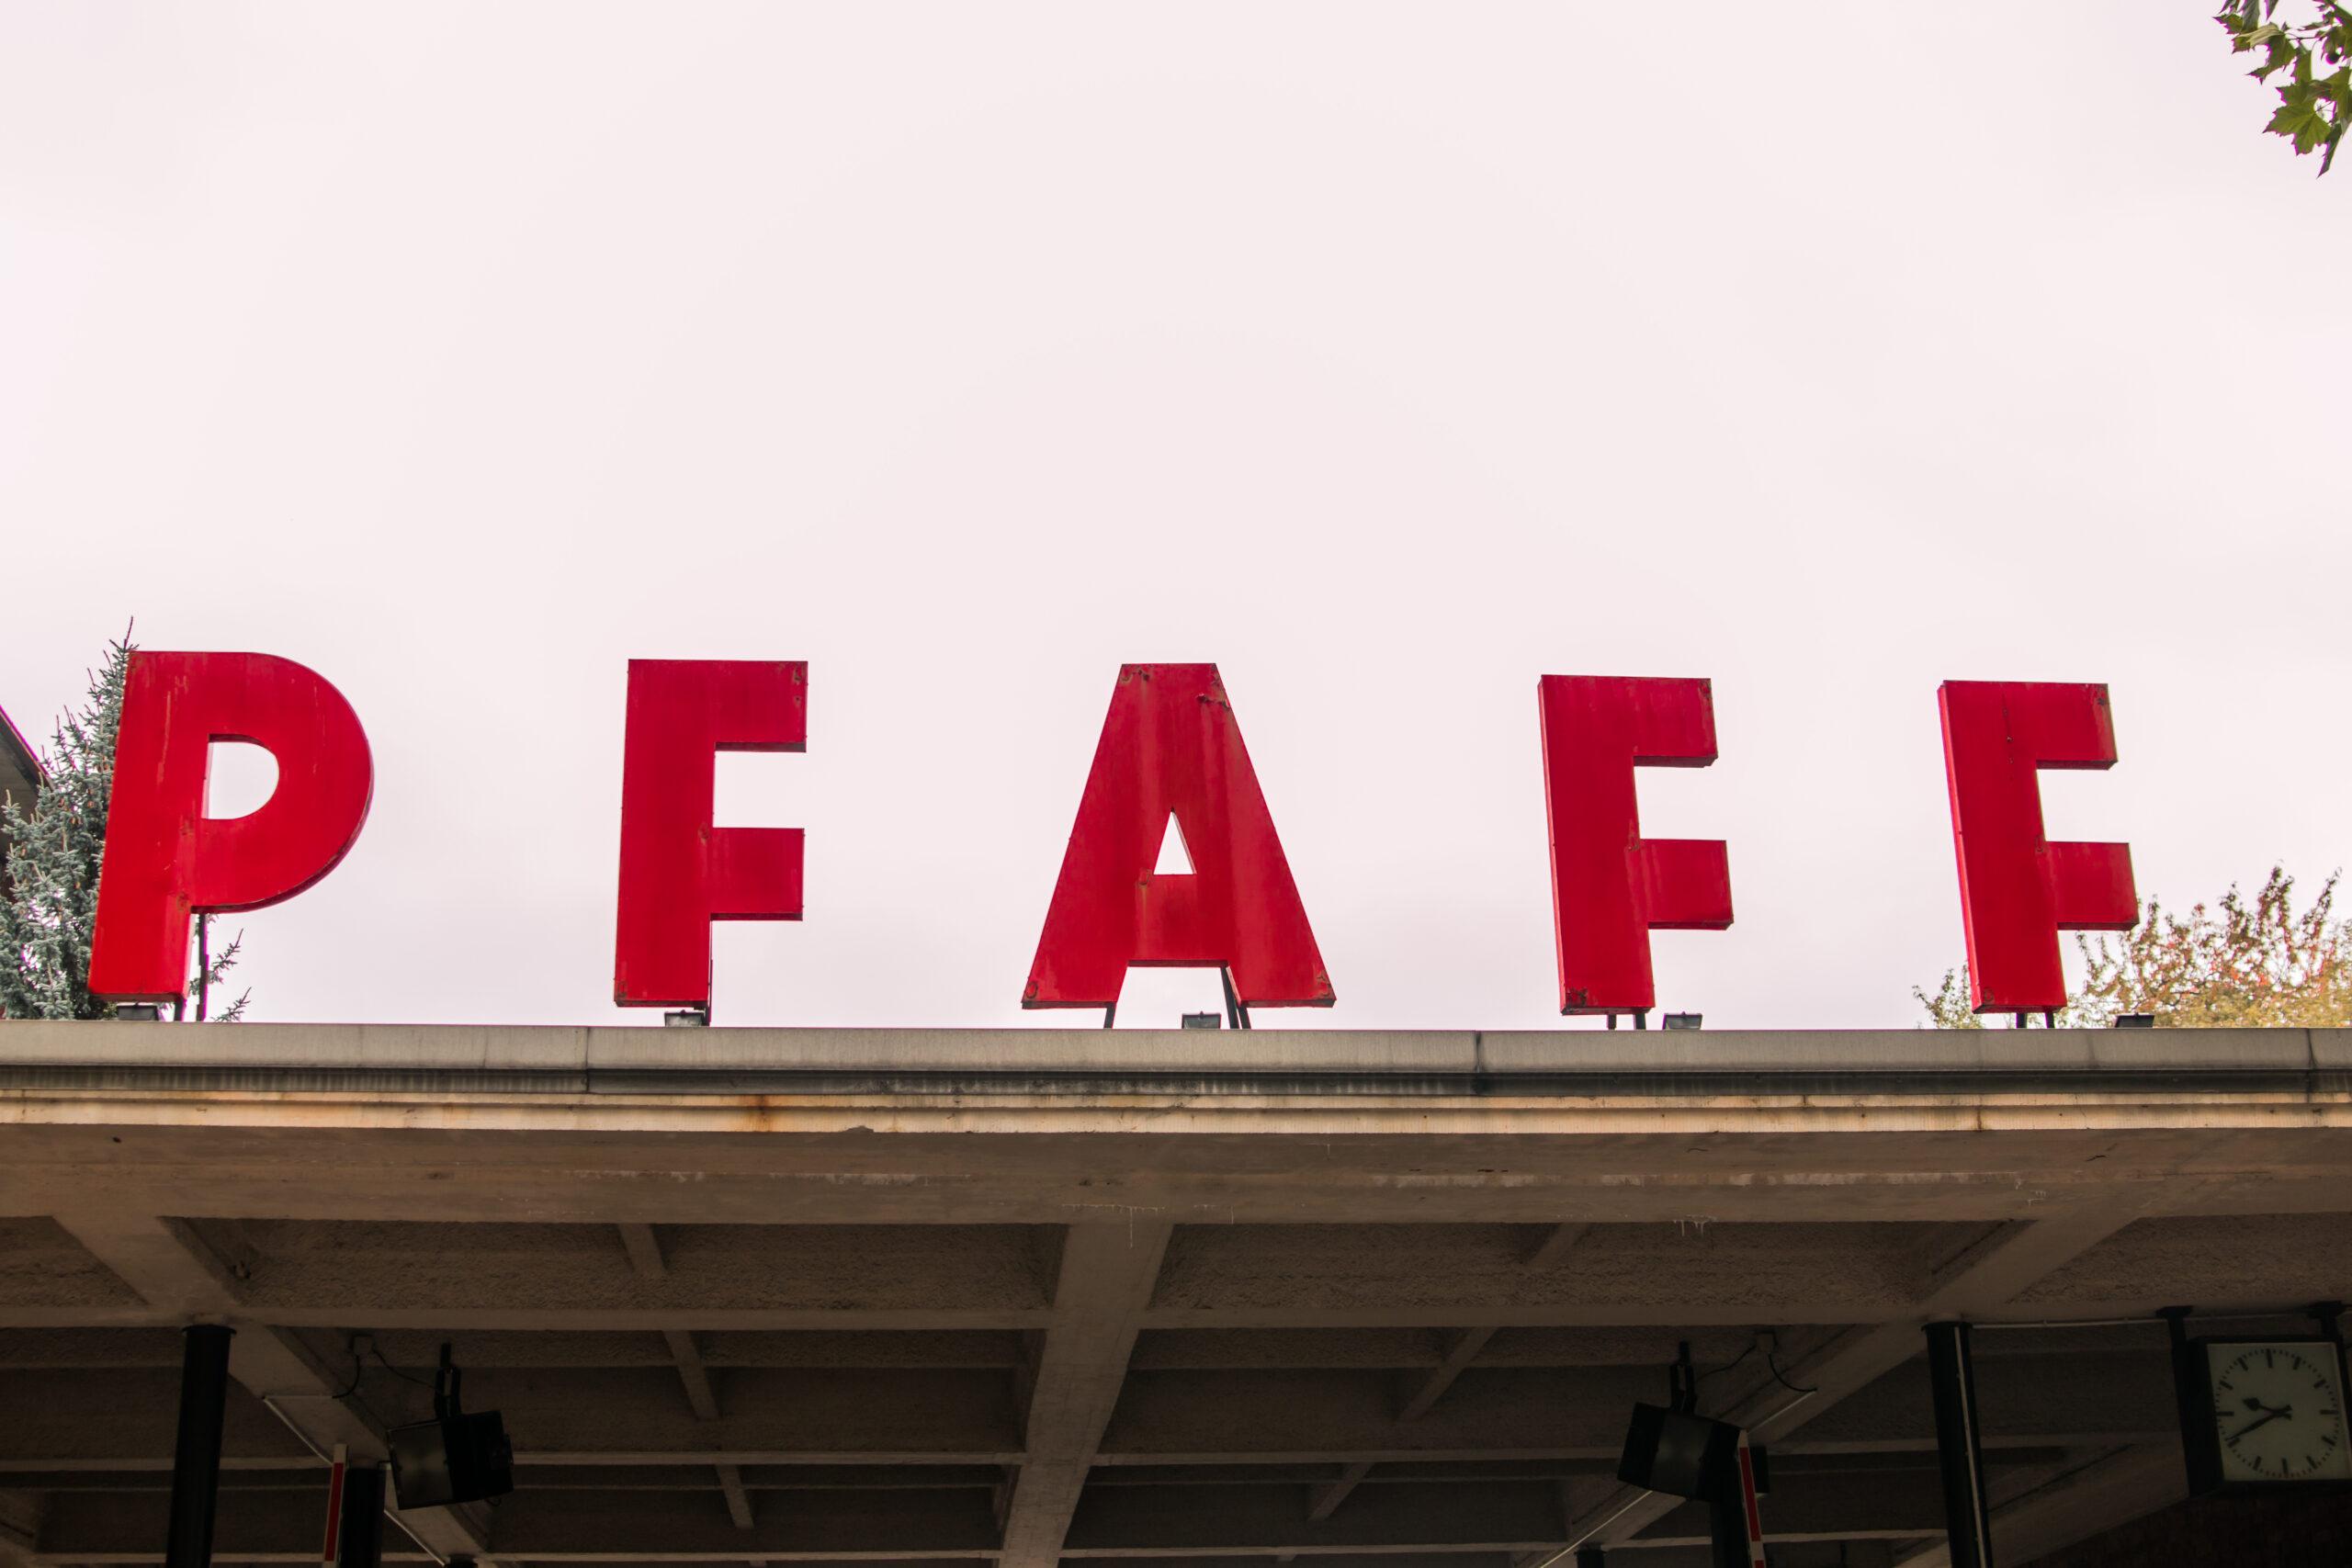 Nahwärme-Konzept fürs Pfaff-Quartier beschlossen